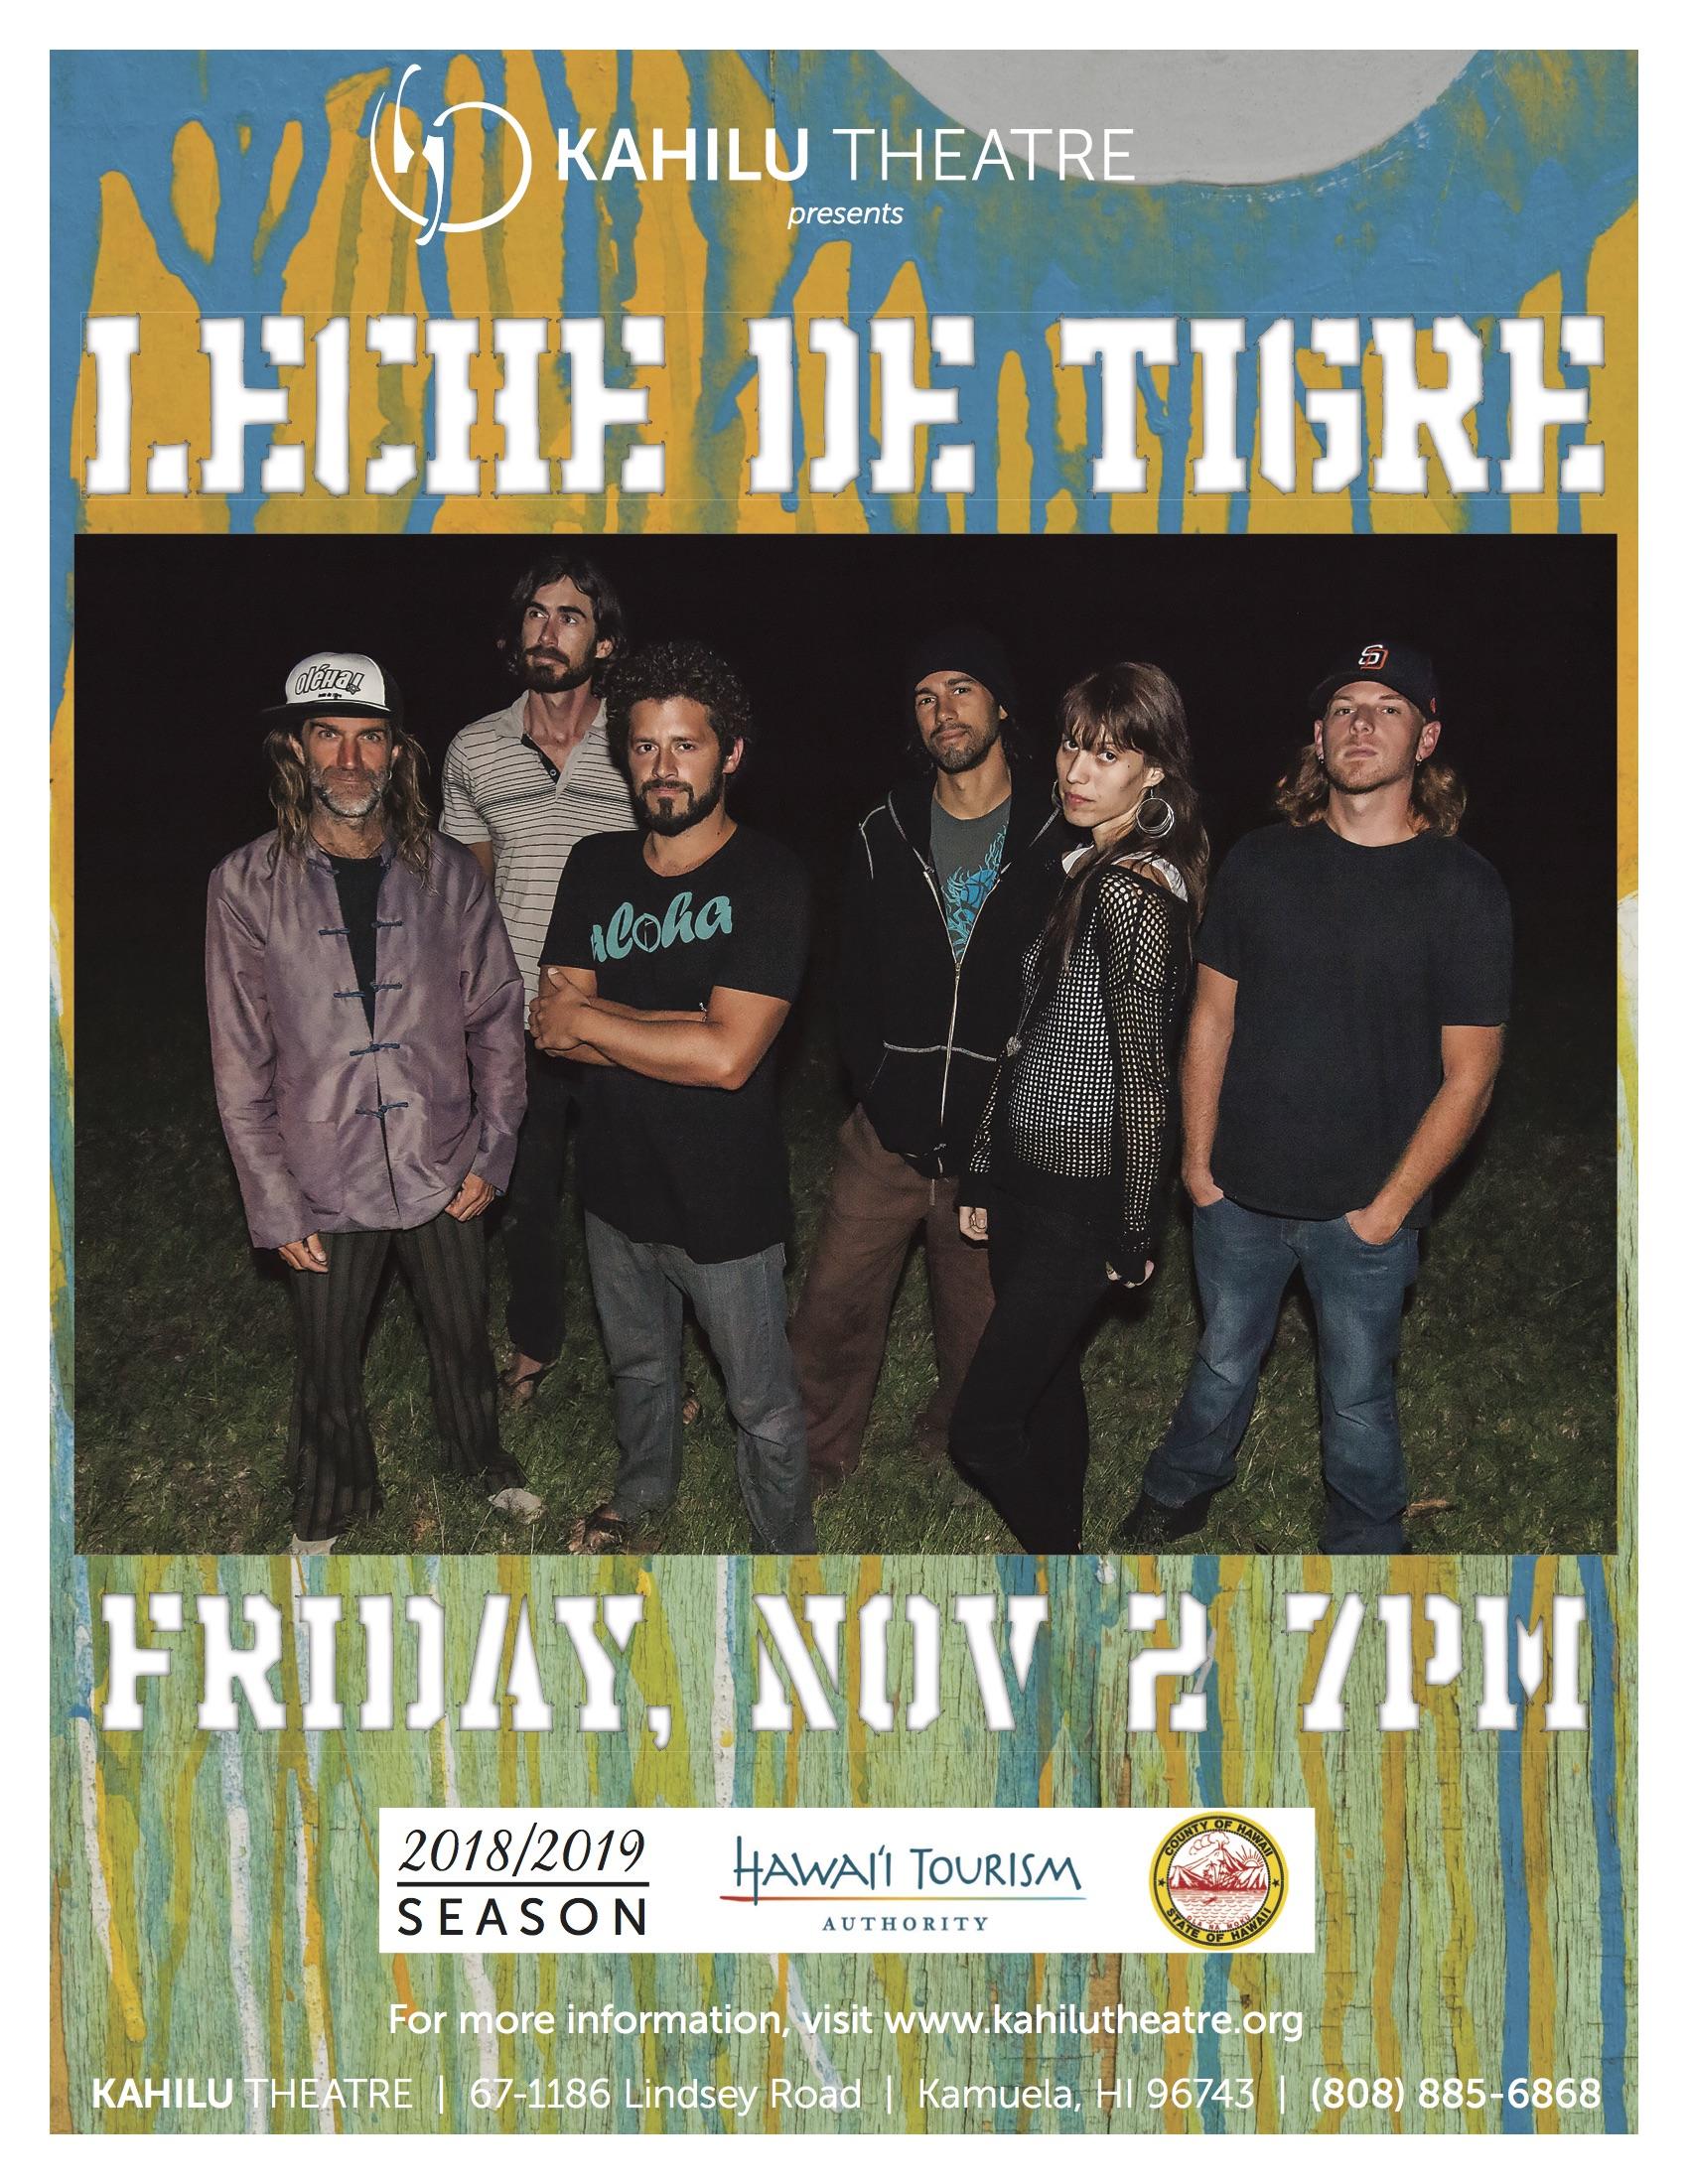 Nov 2nd party w/Leche - Kahilu Theatre Presents